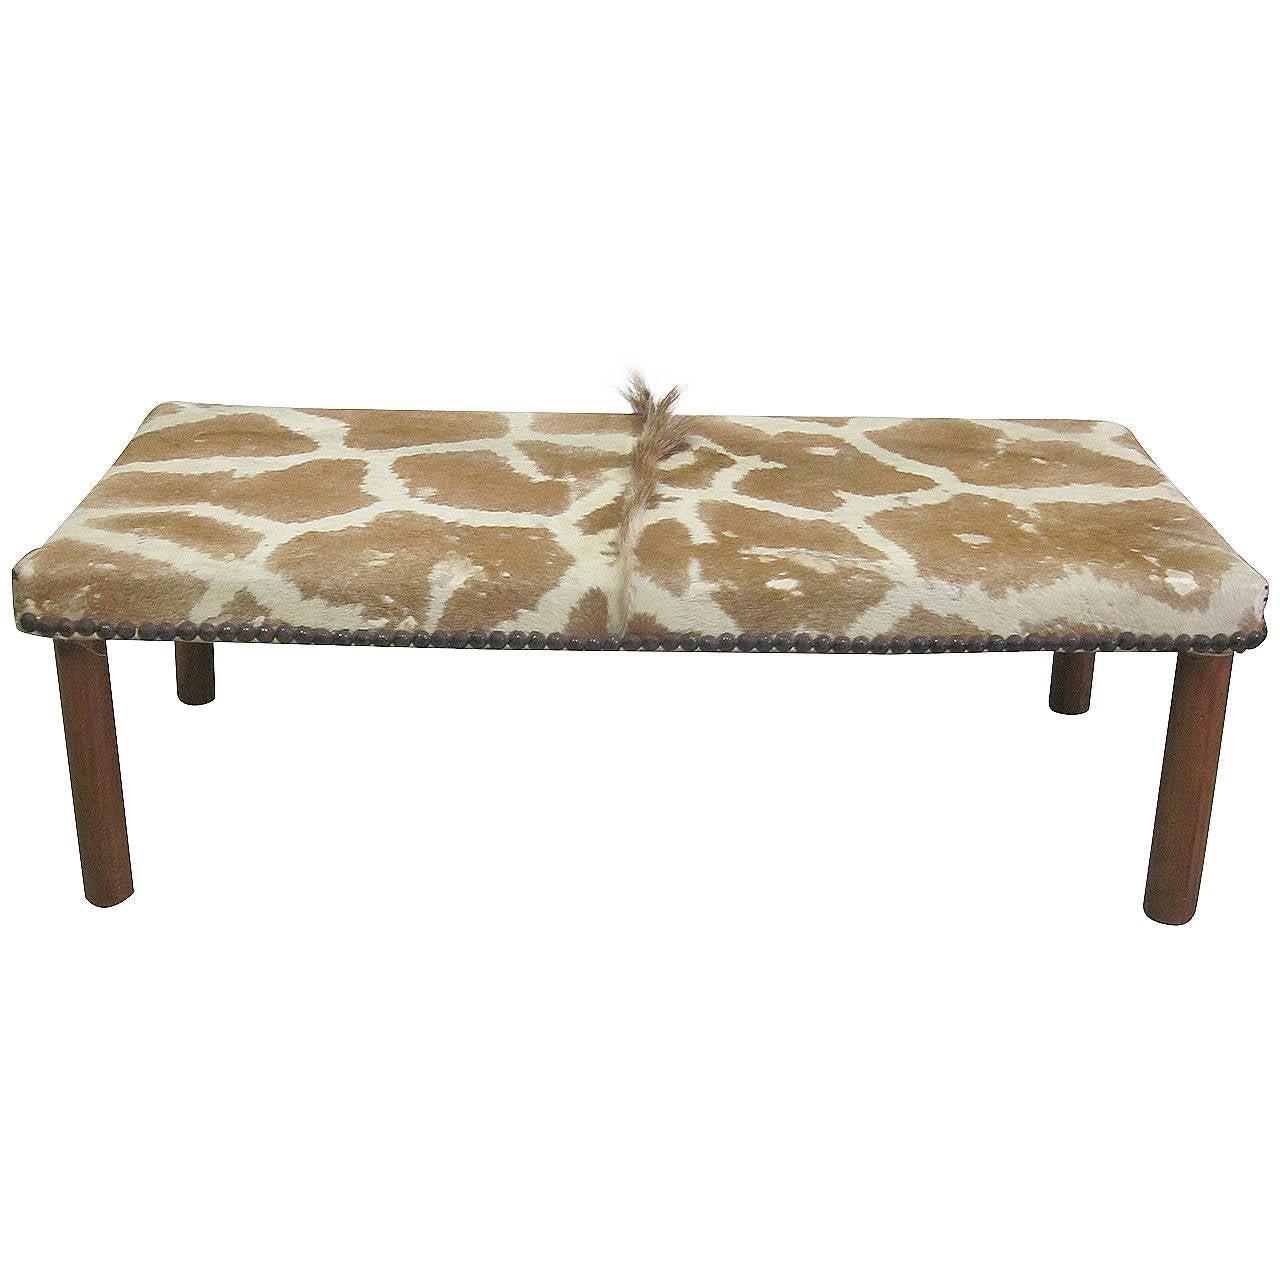 Sober French Mid-Century Modern Bench Covered in Giraffe Skin